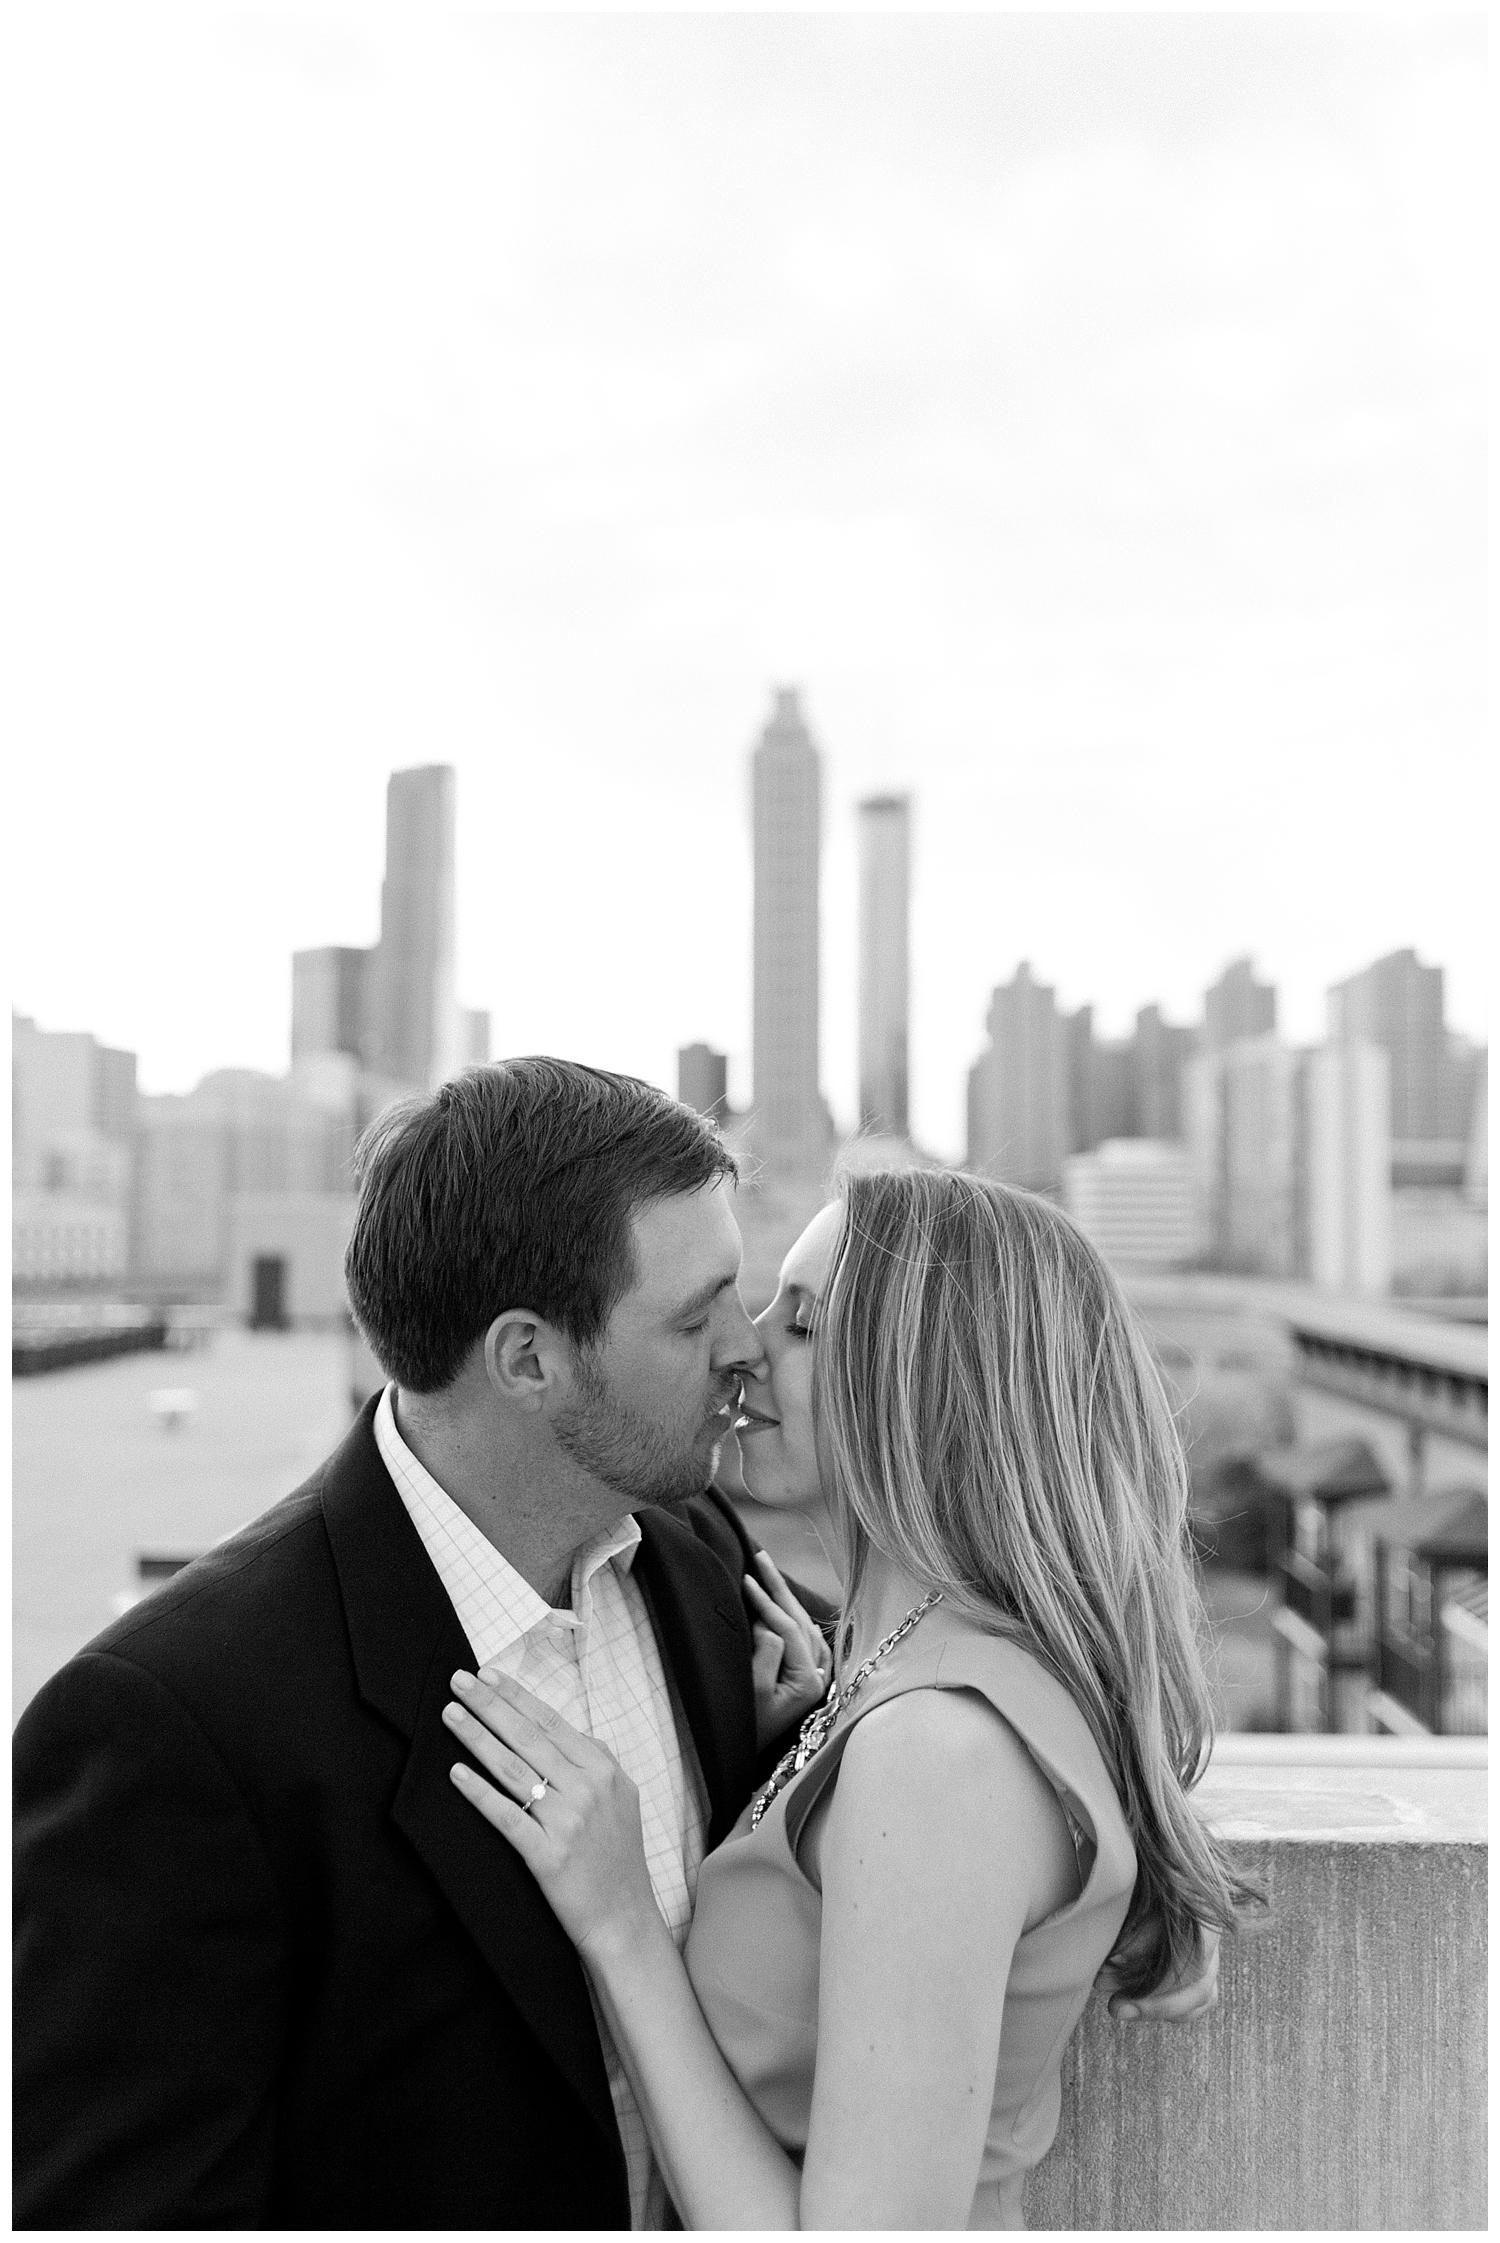 BloomandLo_Abigail&Kyle_Blog_Atlantaphotographer_Engagements_GrantPark_0014.jpg